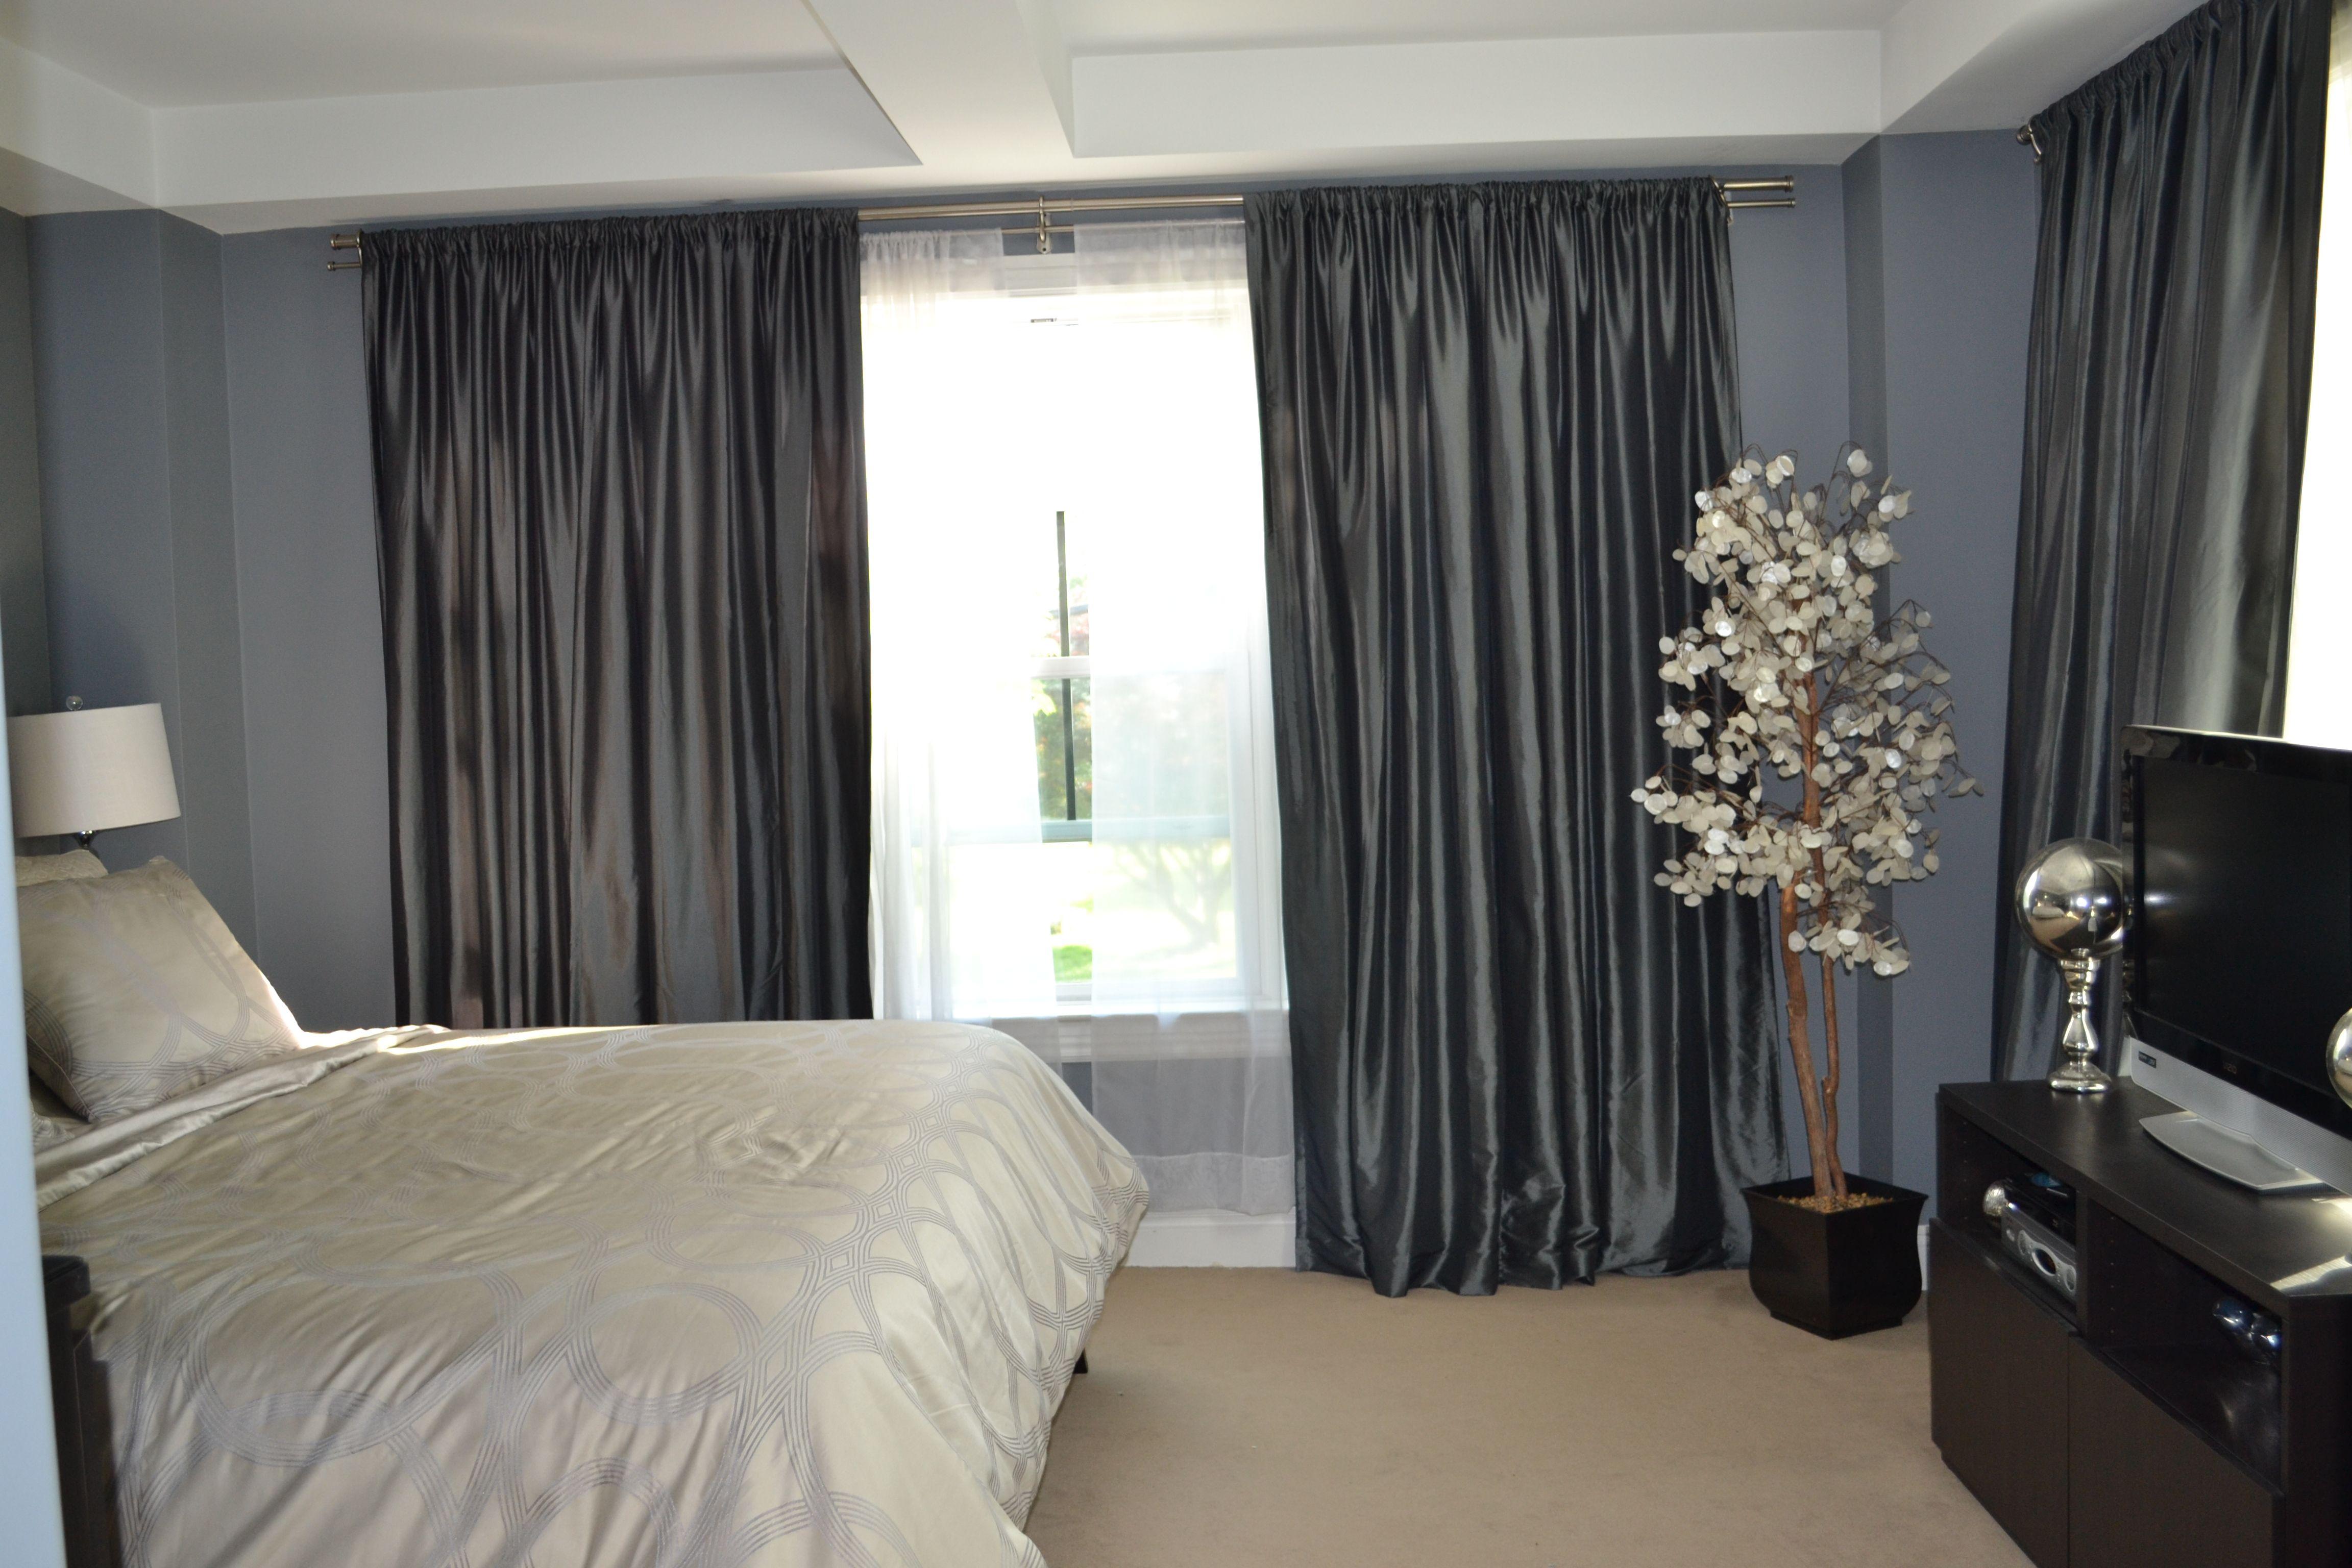 Benjamin Moore Aura Deep Silver Bedroom Apartment Decor